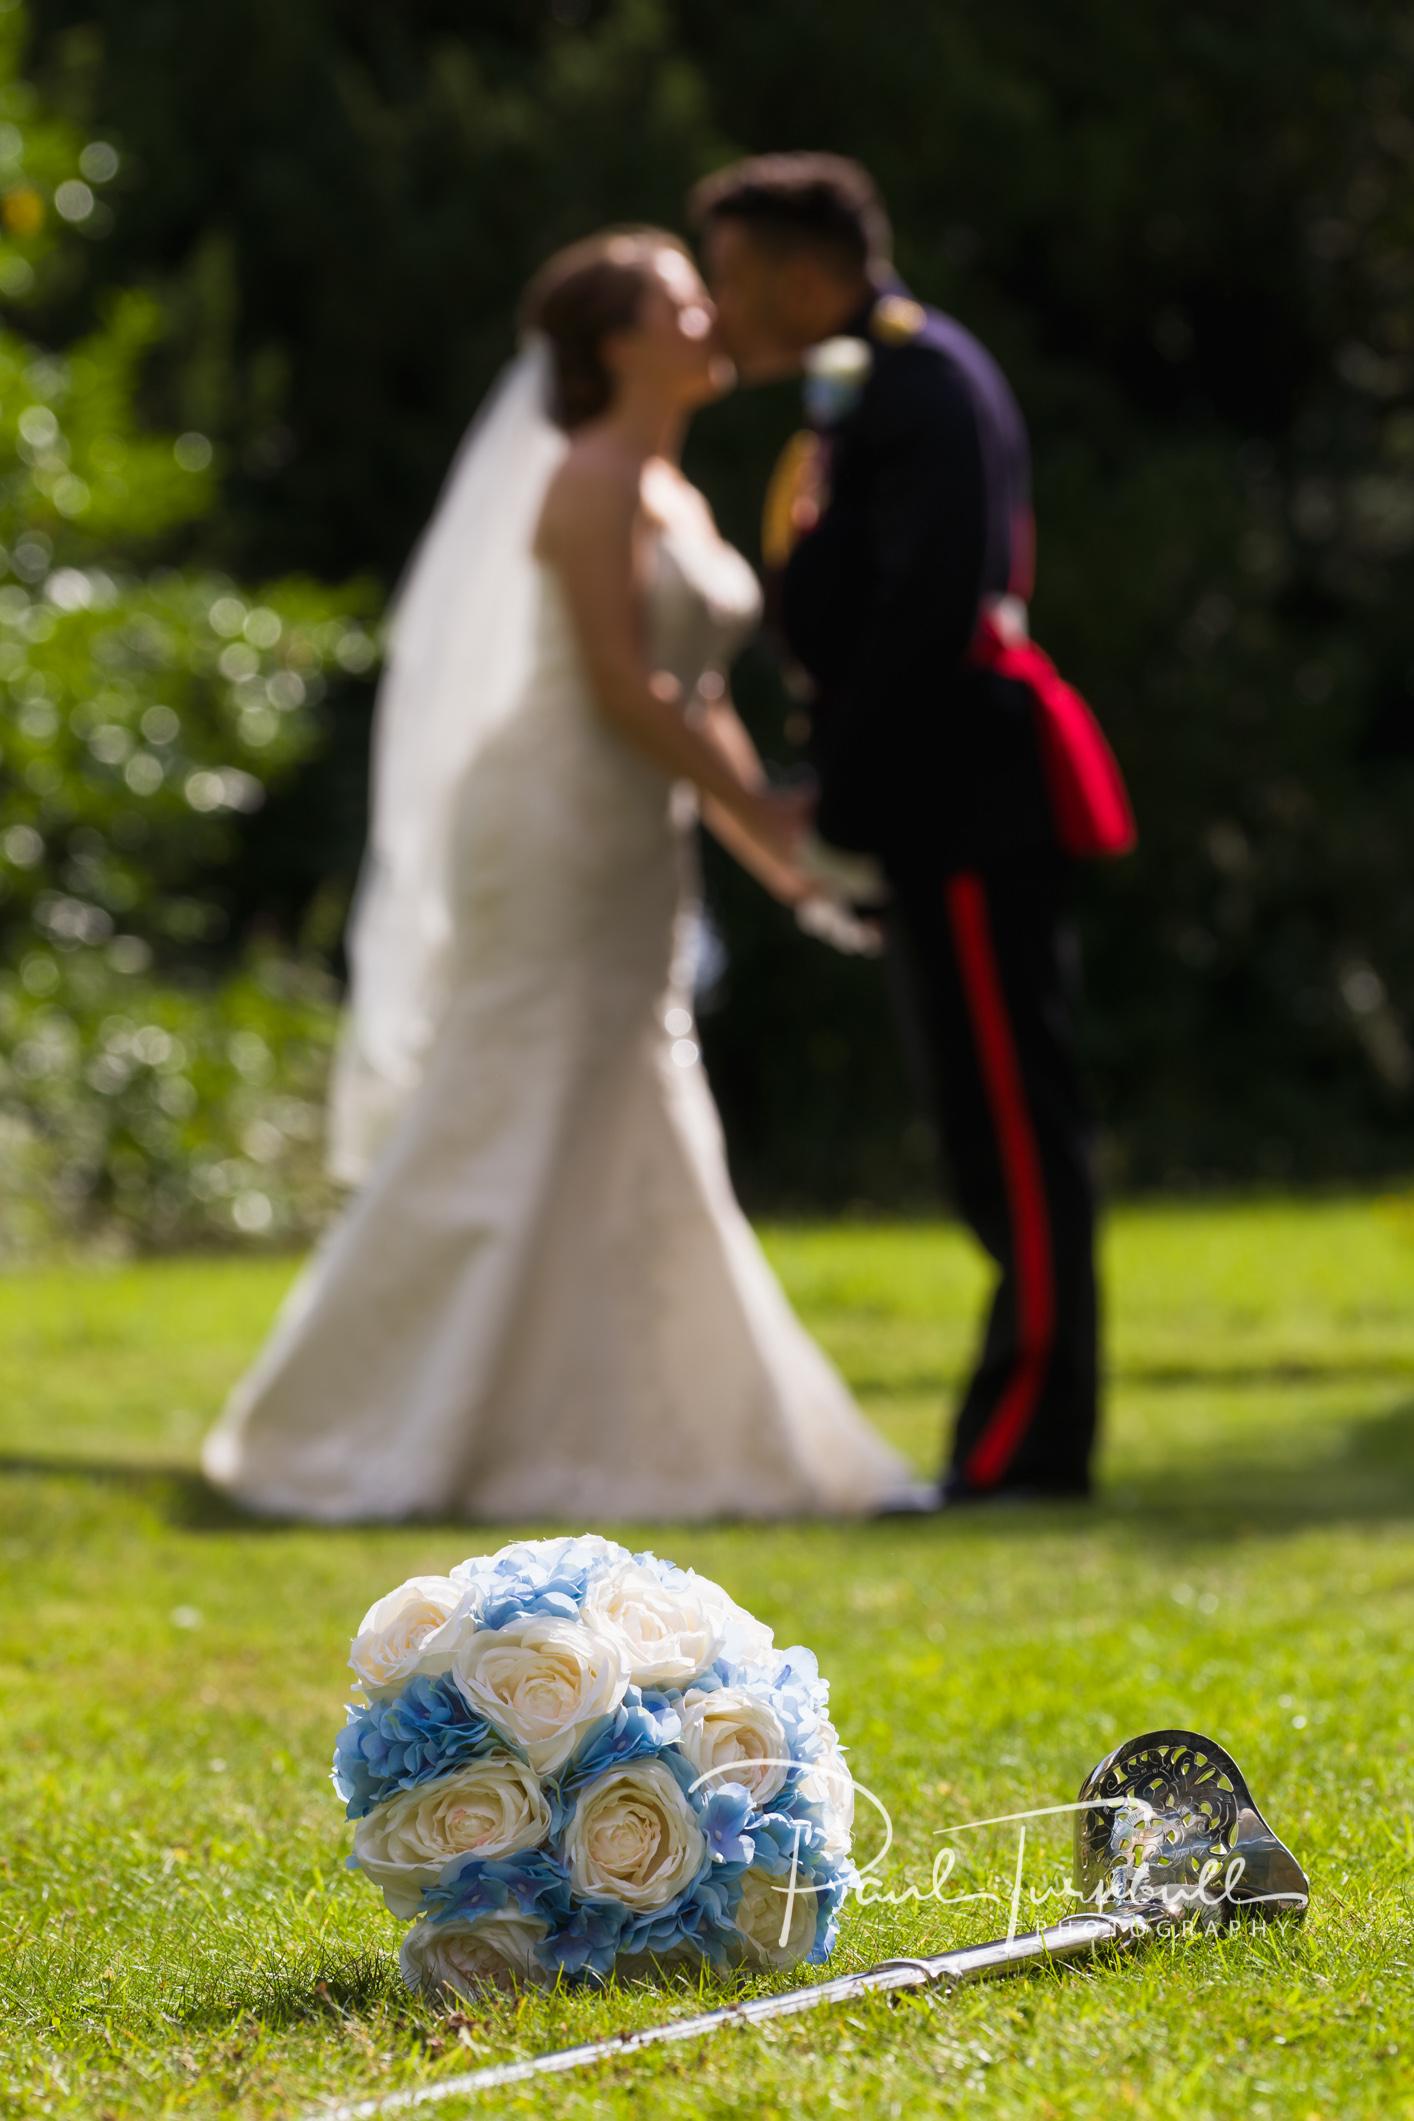 wedding-photographer-south-dalton-walkington-yorkshire-emma-james-043.jpg